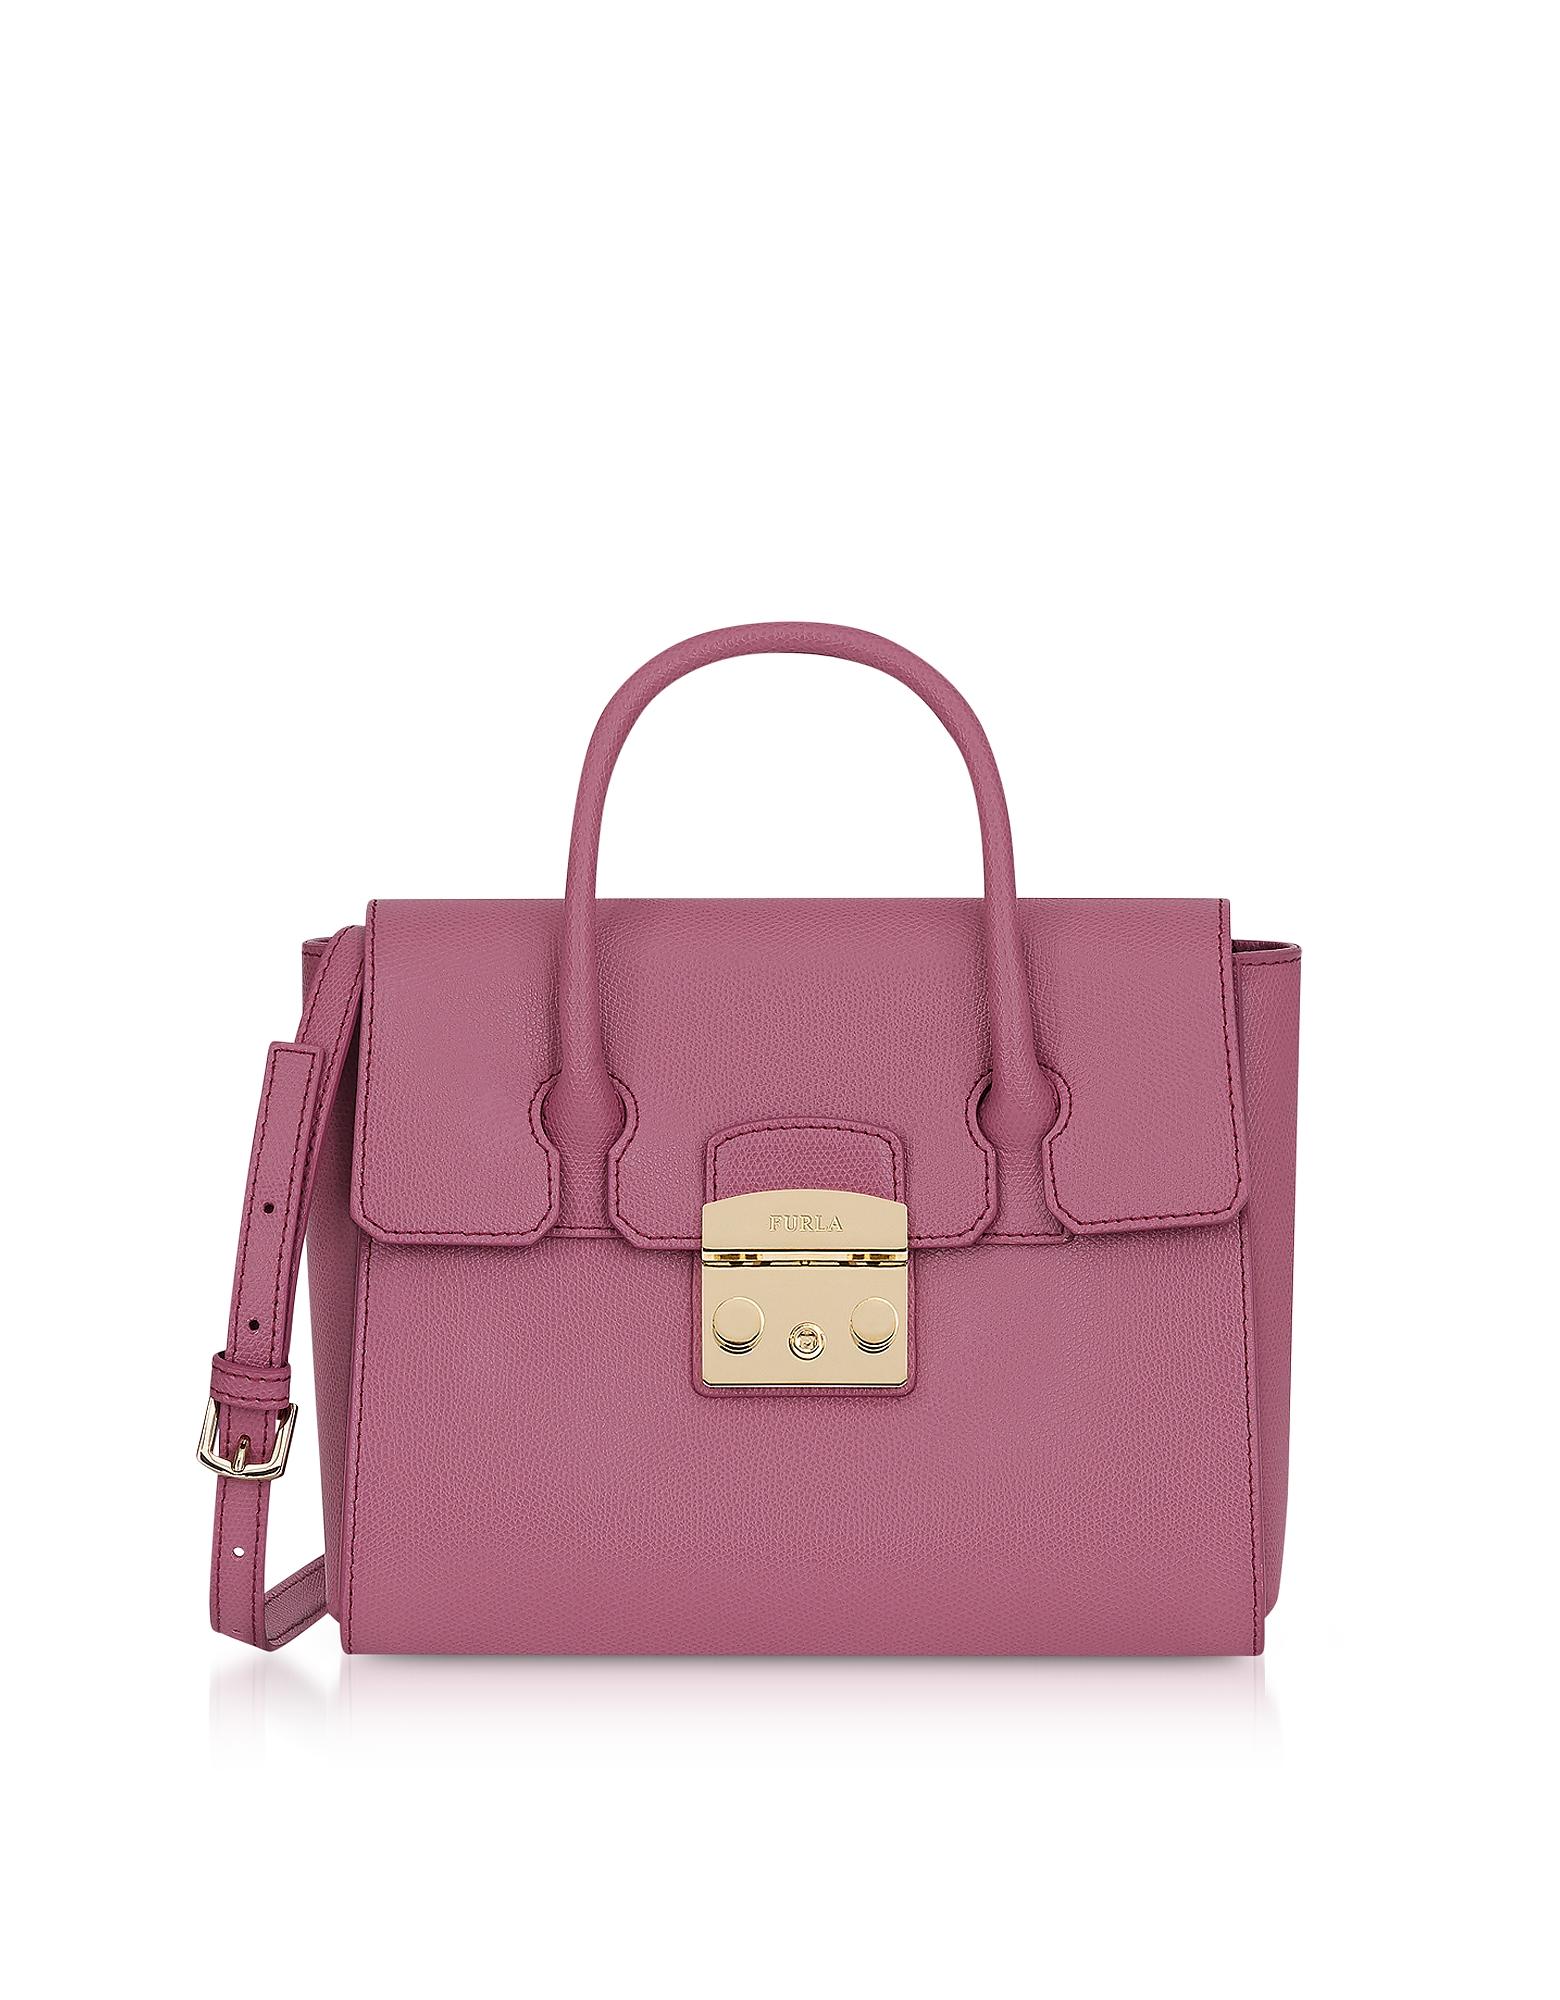 Furla Handbags, Metropolis Small Satchel Bag